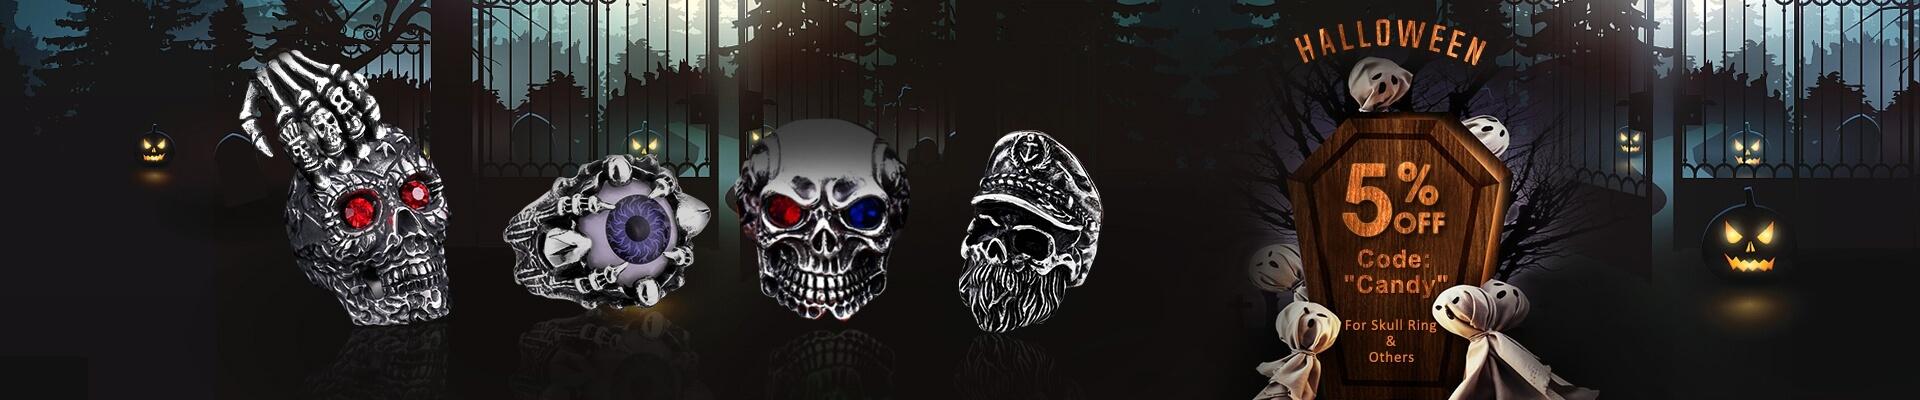 Urcoco Halloween Rings